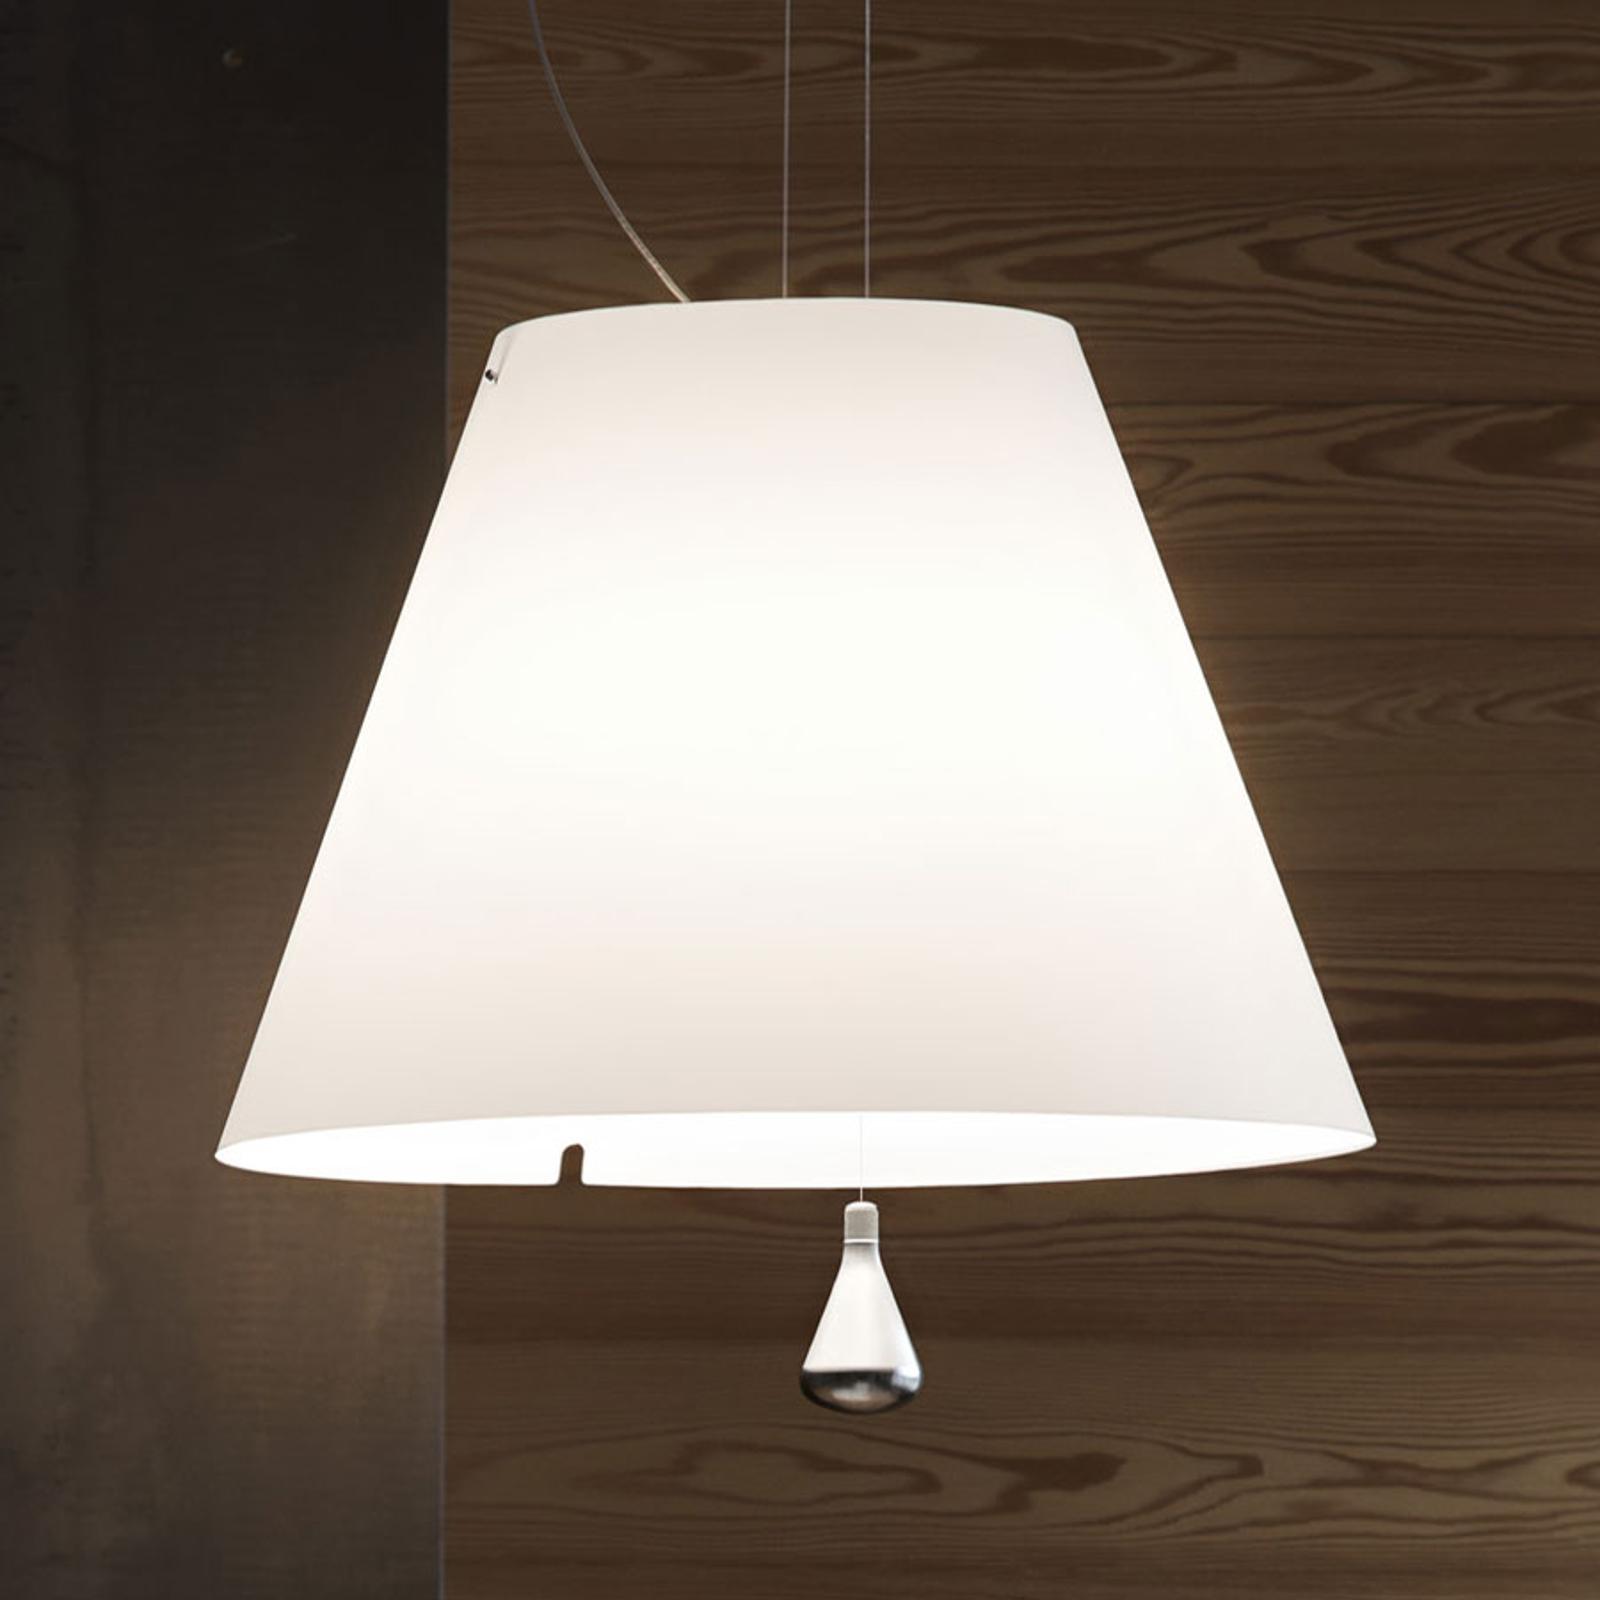 Luceplan Costanza hængelampe D13sas, hvid